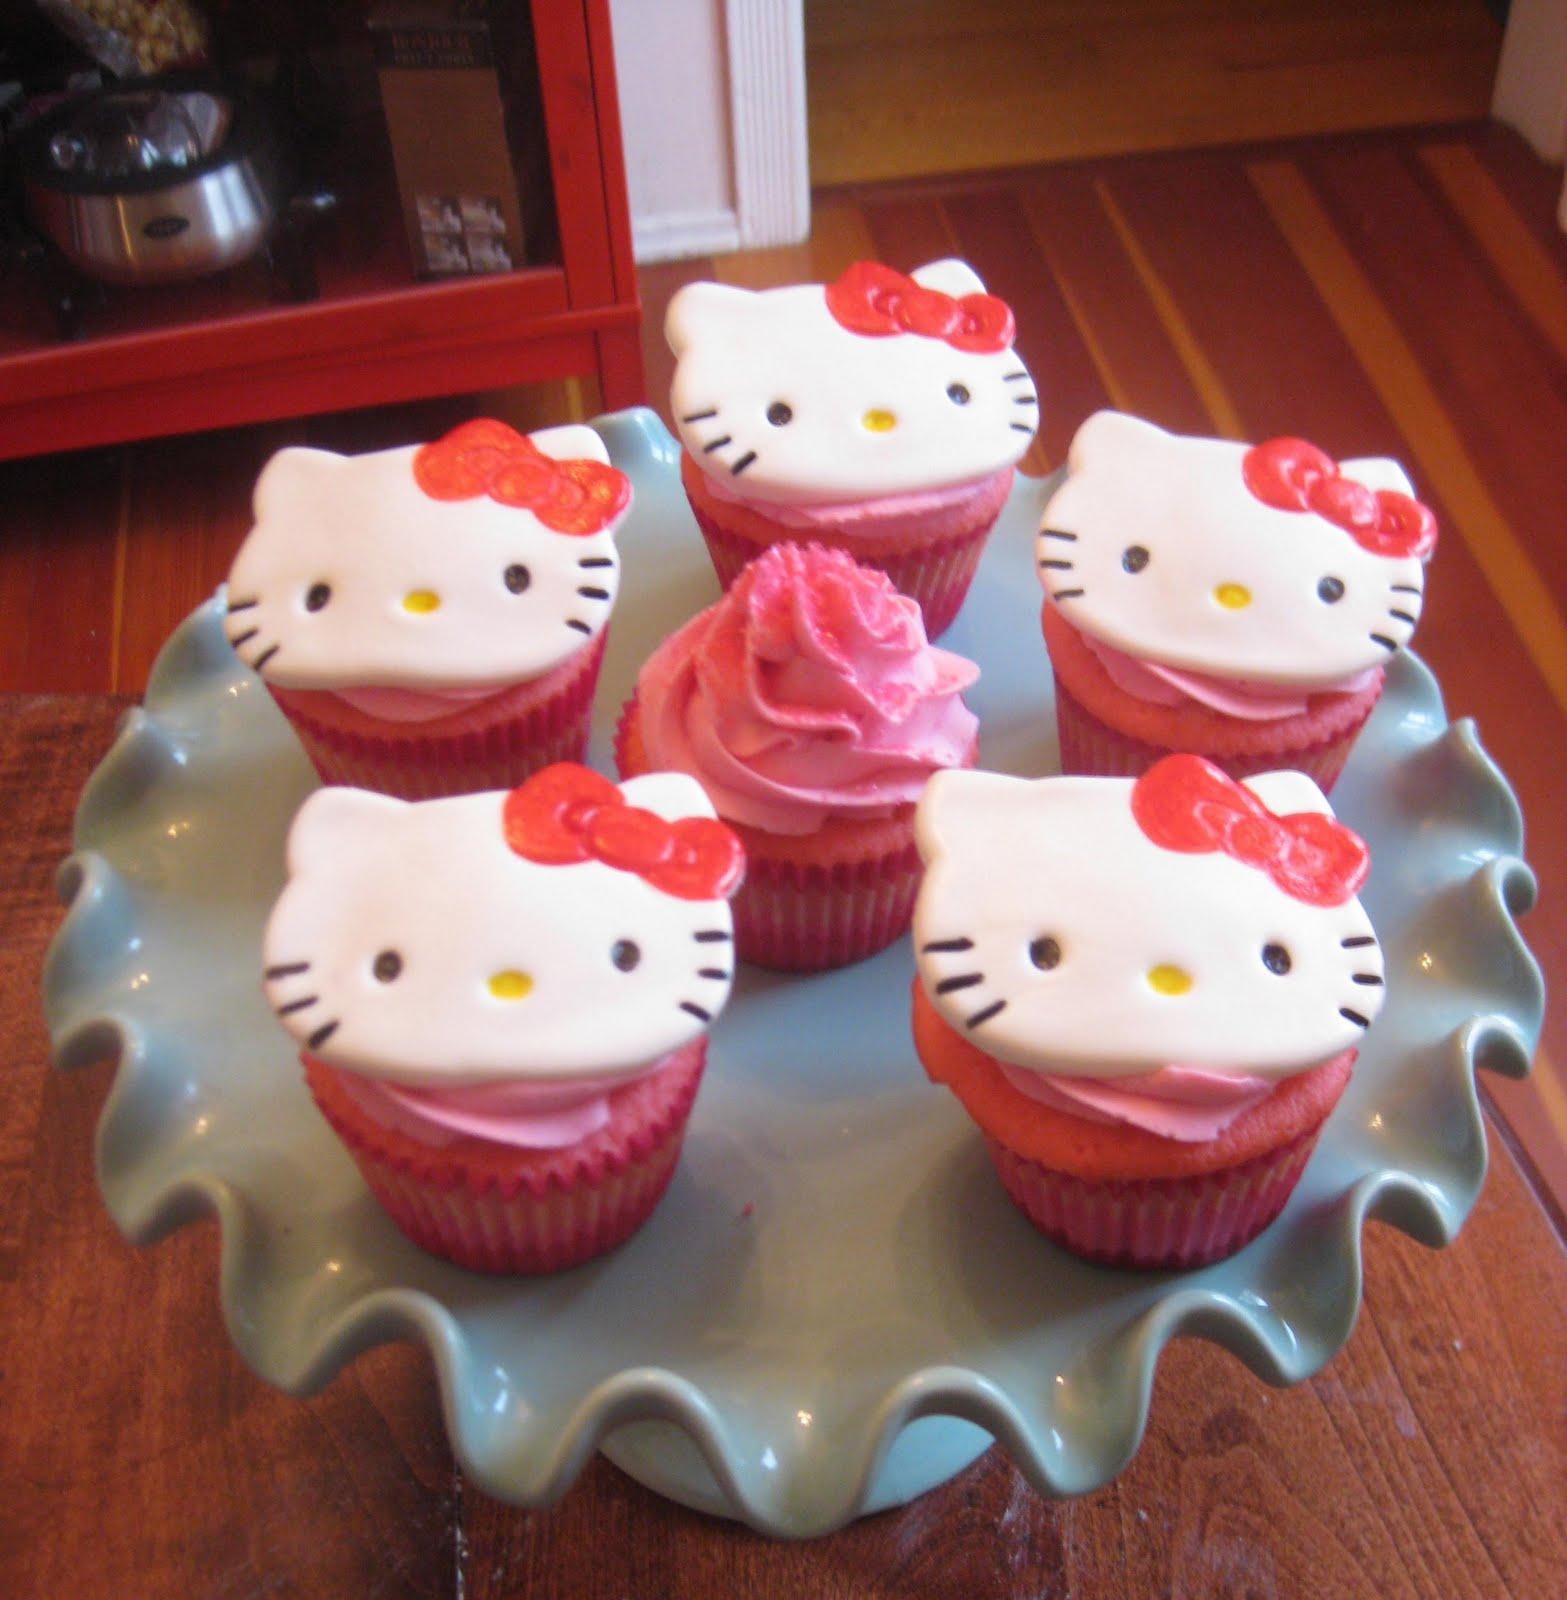 Pixie Crust Hello Kitty Cupcakes Quot Pink Velvet Quot Stuffed